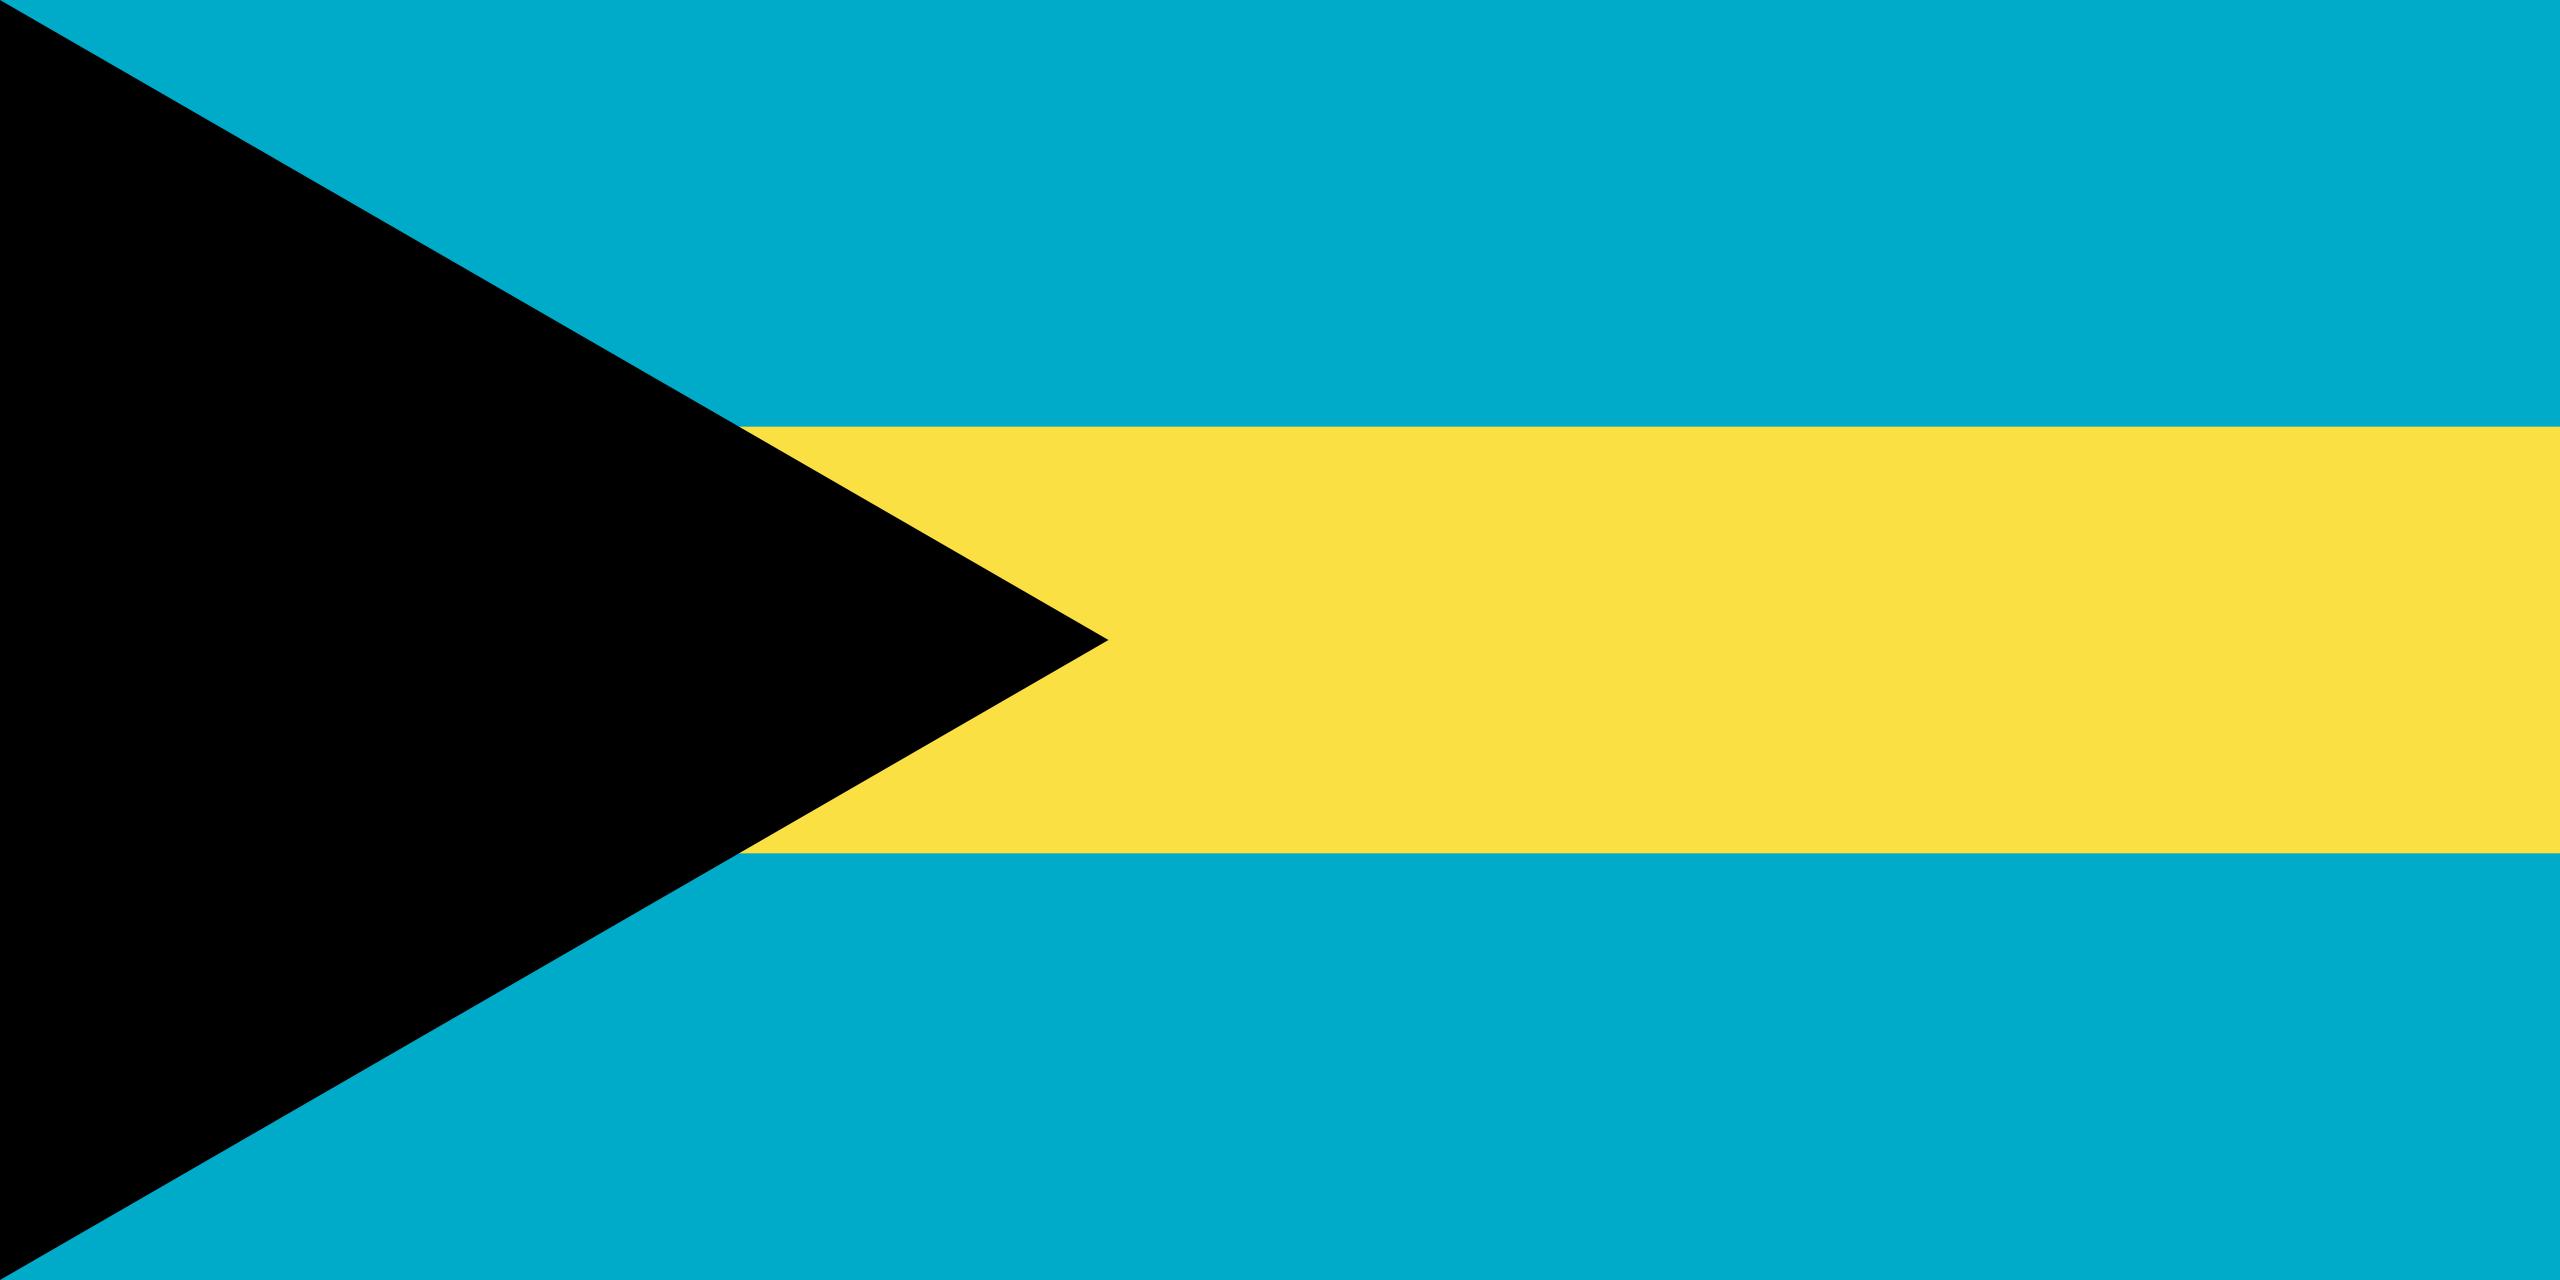 bahamas, страна, Эмблема, логотип, символ - Обои HD - Профессор falken.com